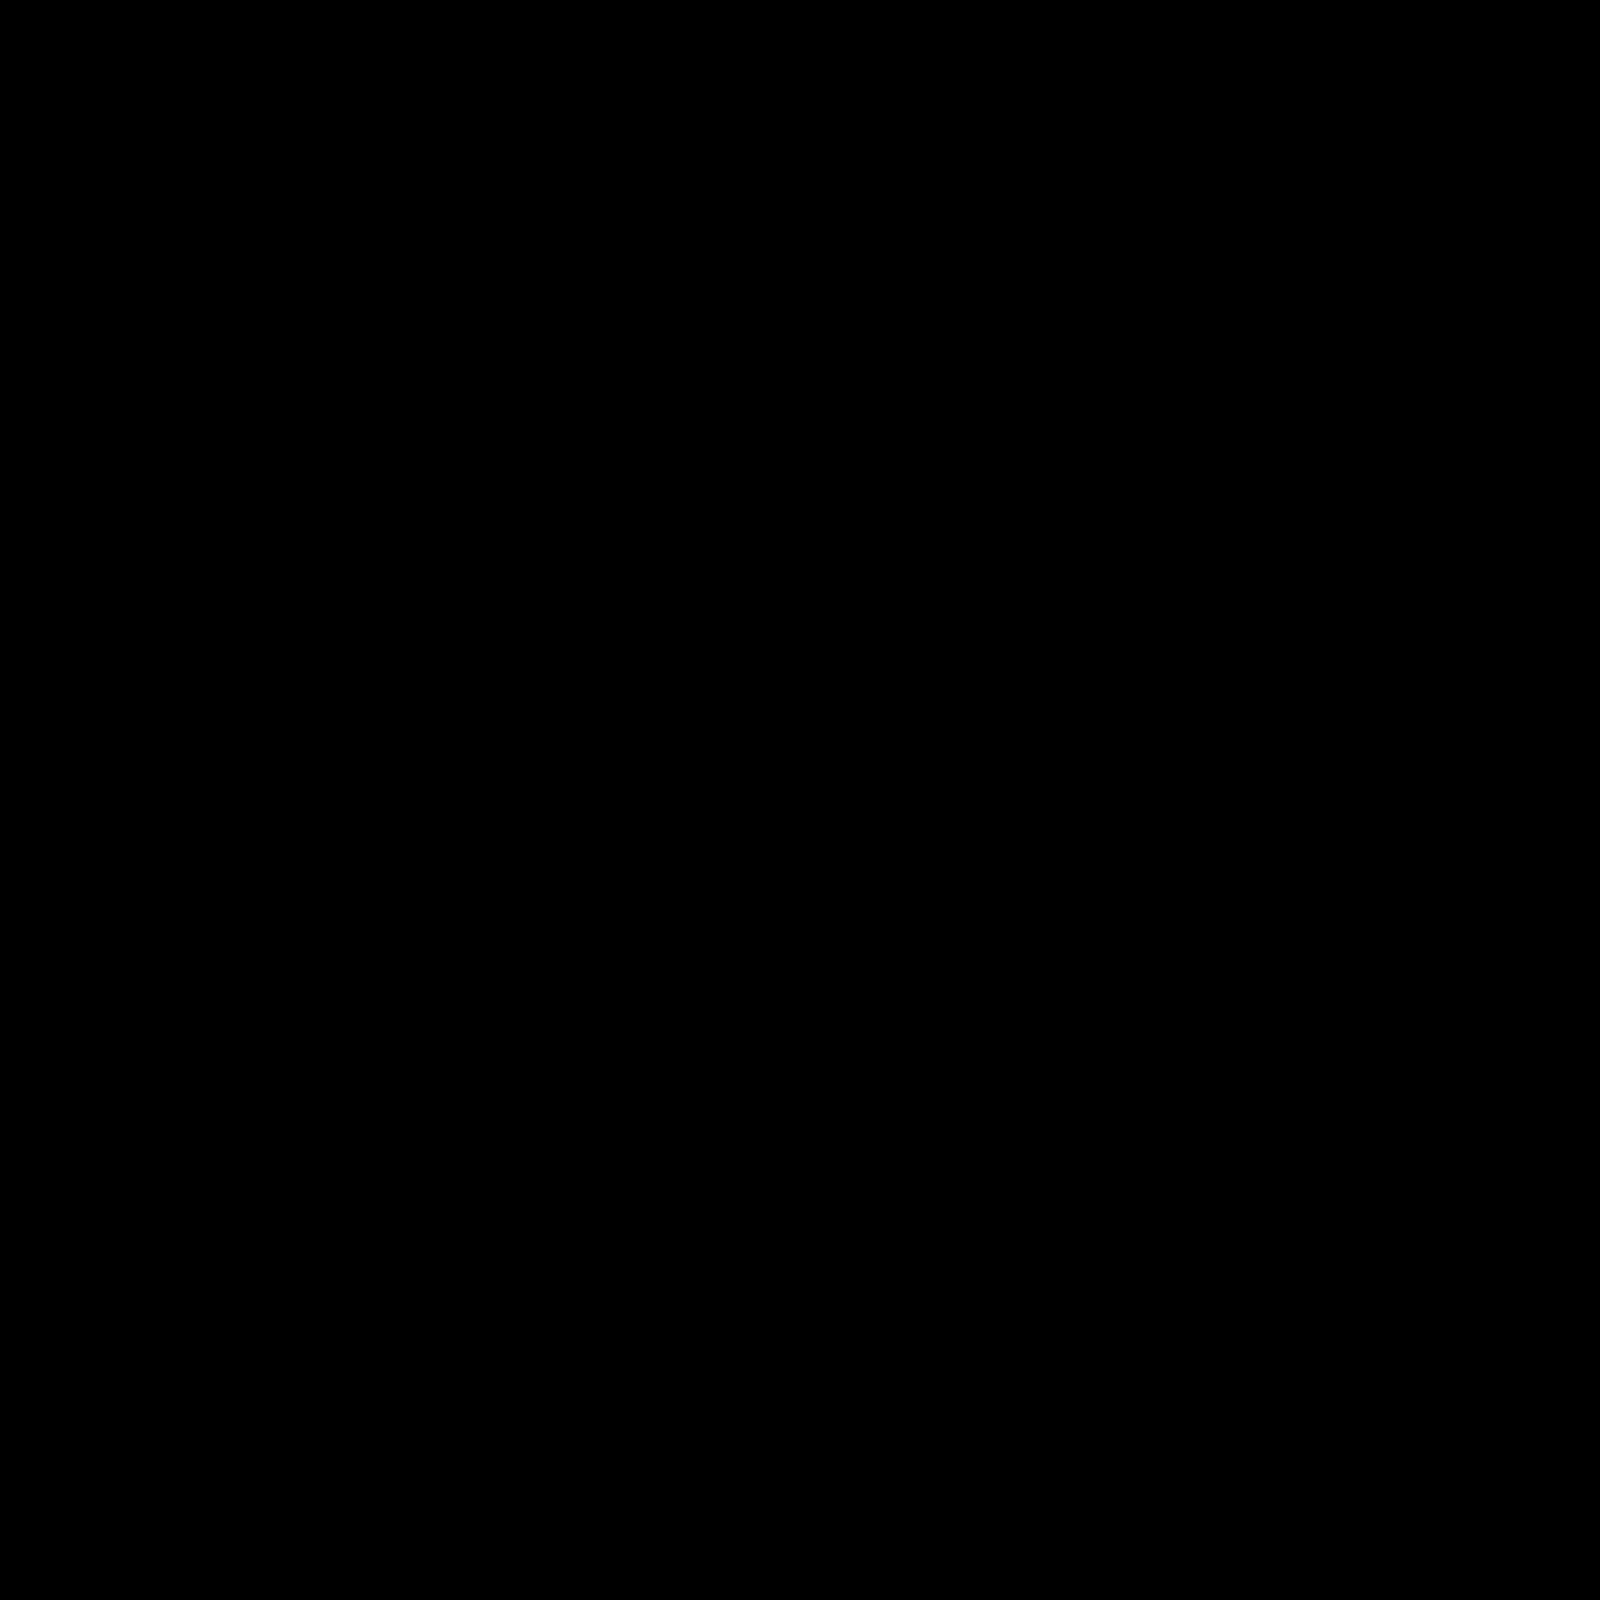 Autocarro de Dois Andares icon